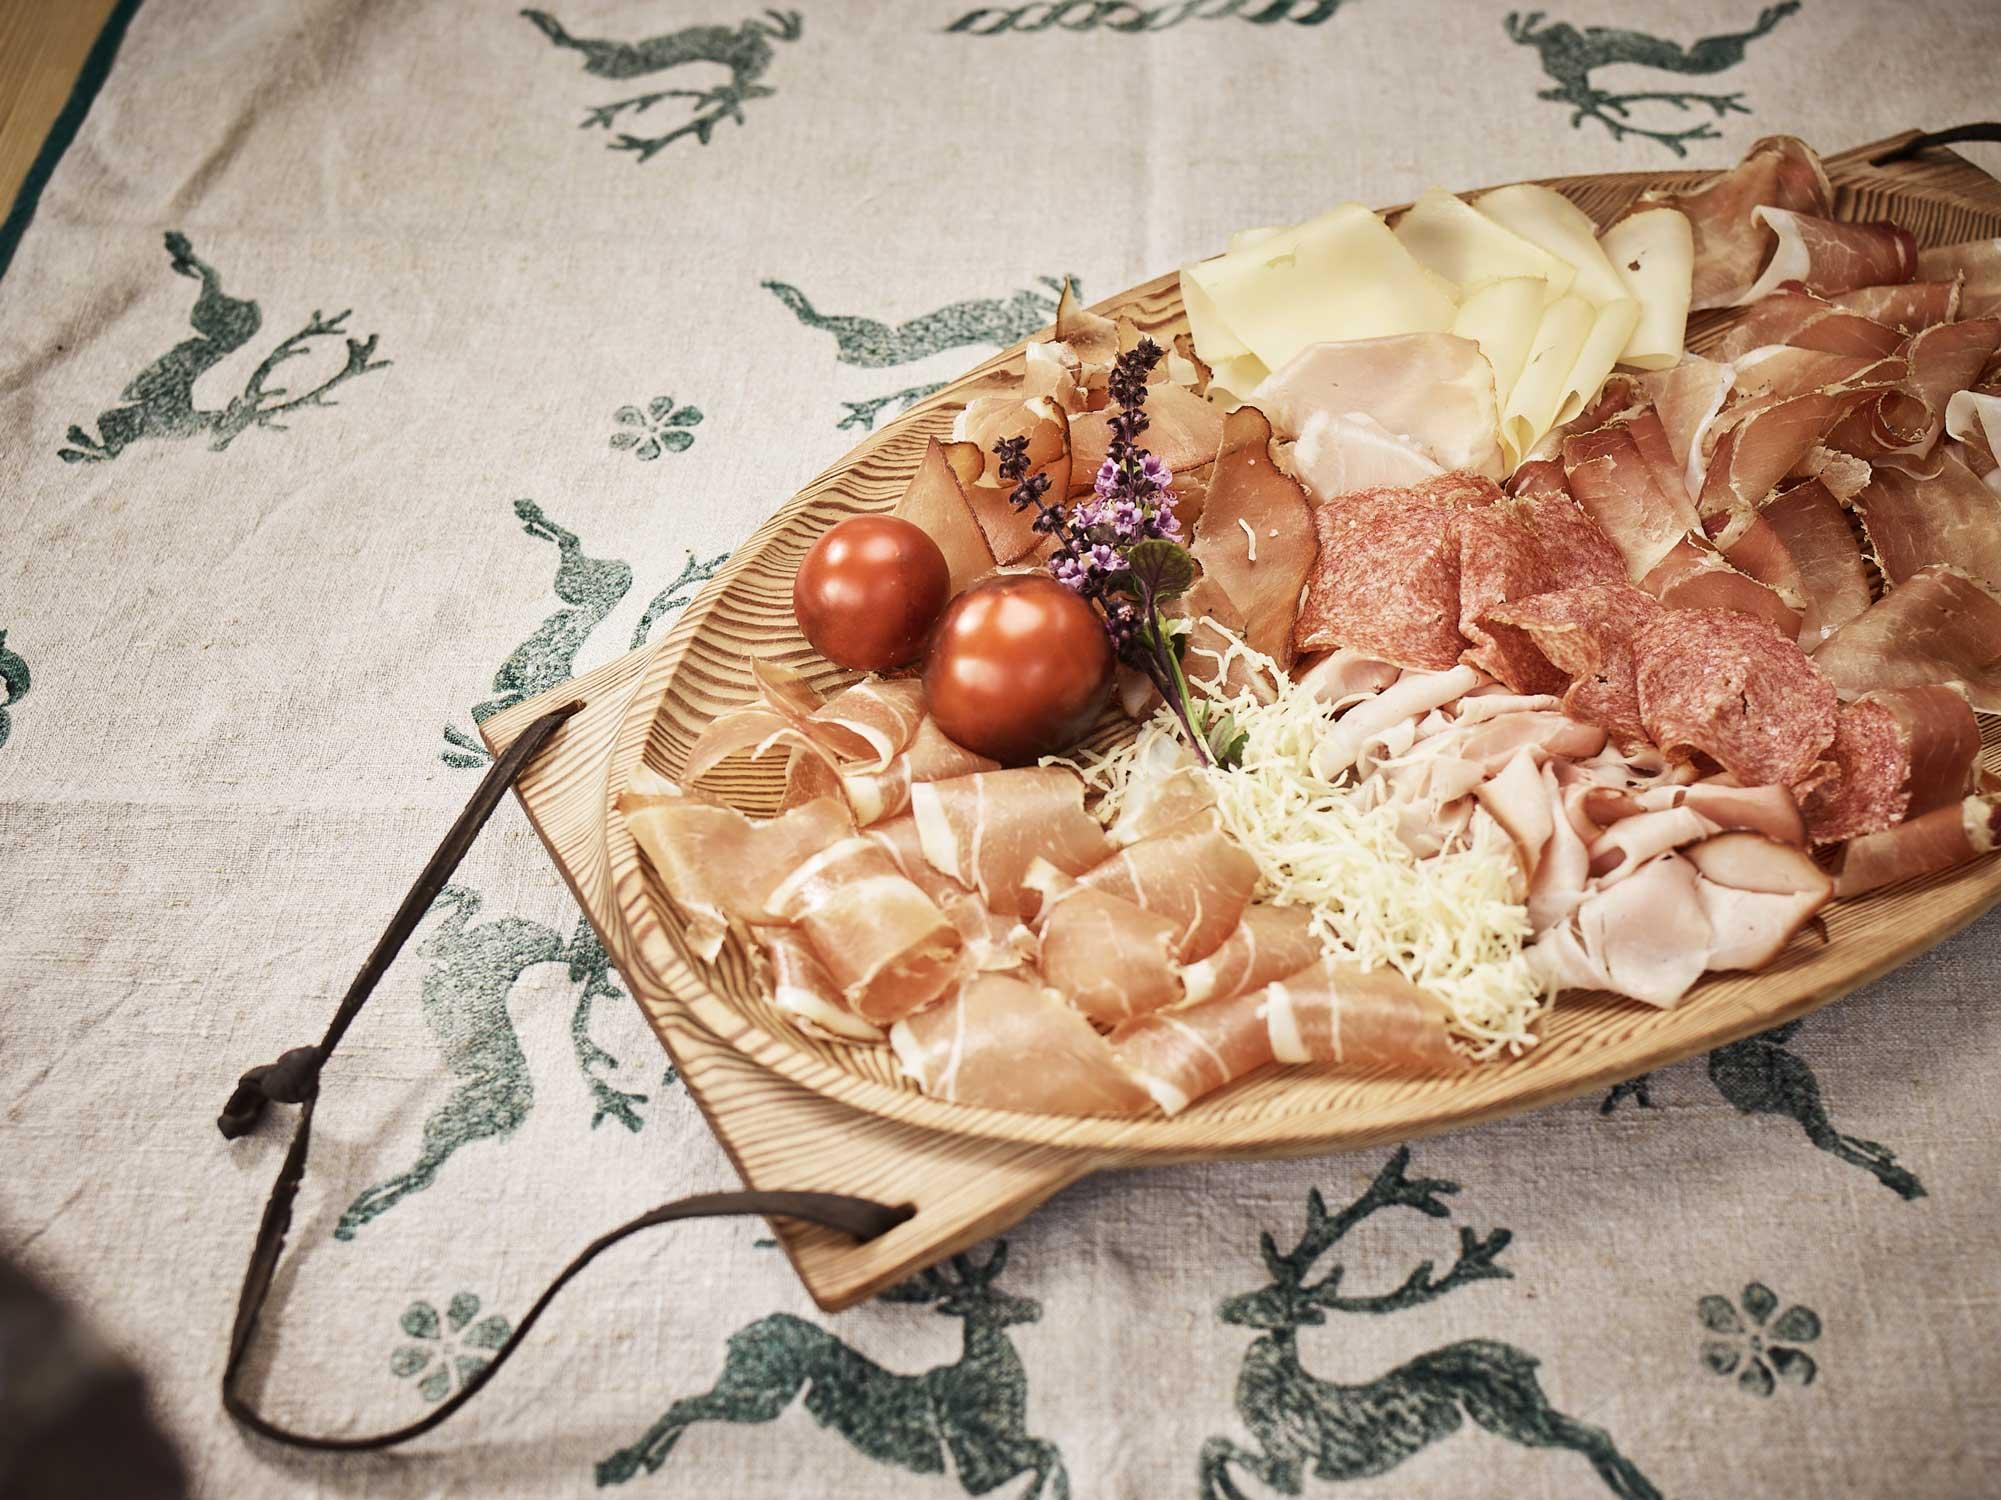 Brettljause mit Speck, Schinken, Salami, Käse, Tomaten, Kren